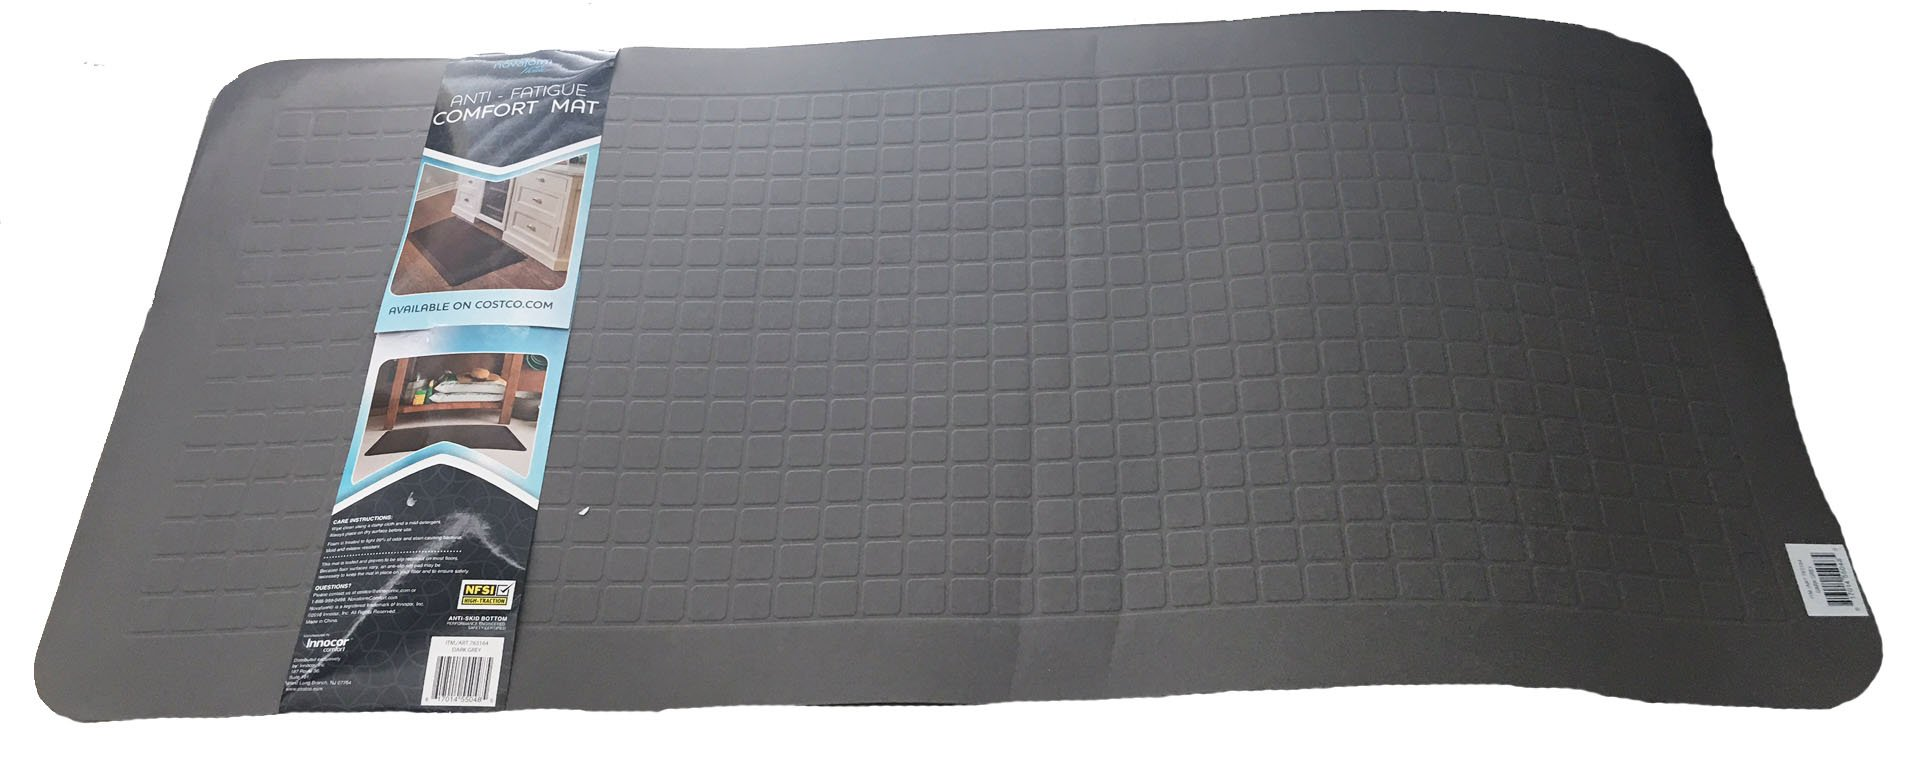 Novaform Dark Grey Anti-fatigue Comfort Mat 20'' x 42'' by Novaform